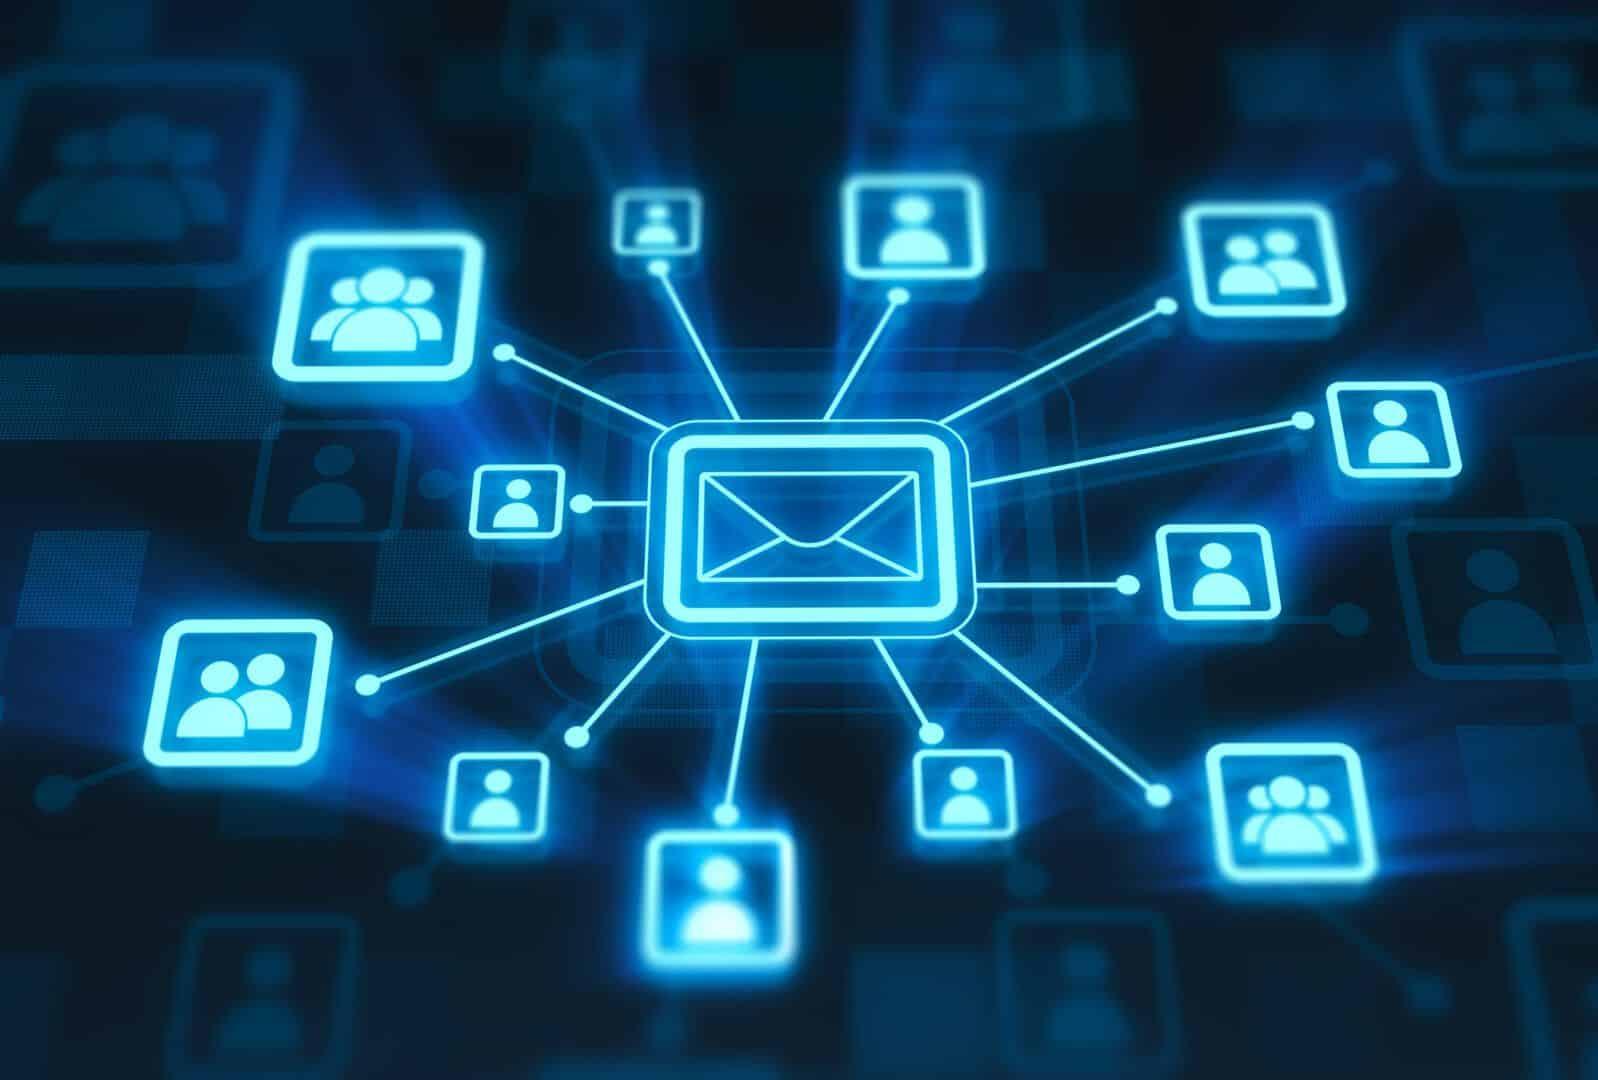 O que é intranet - características, utilidades e benefícios da rede